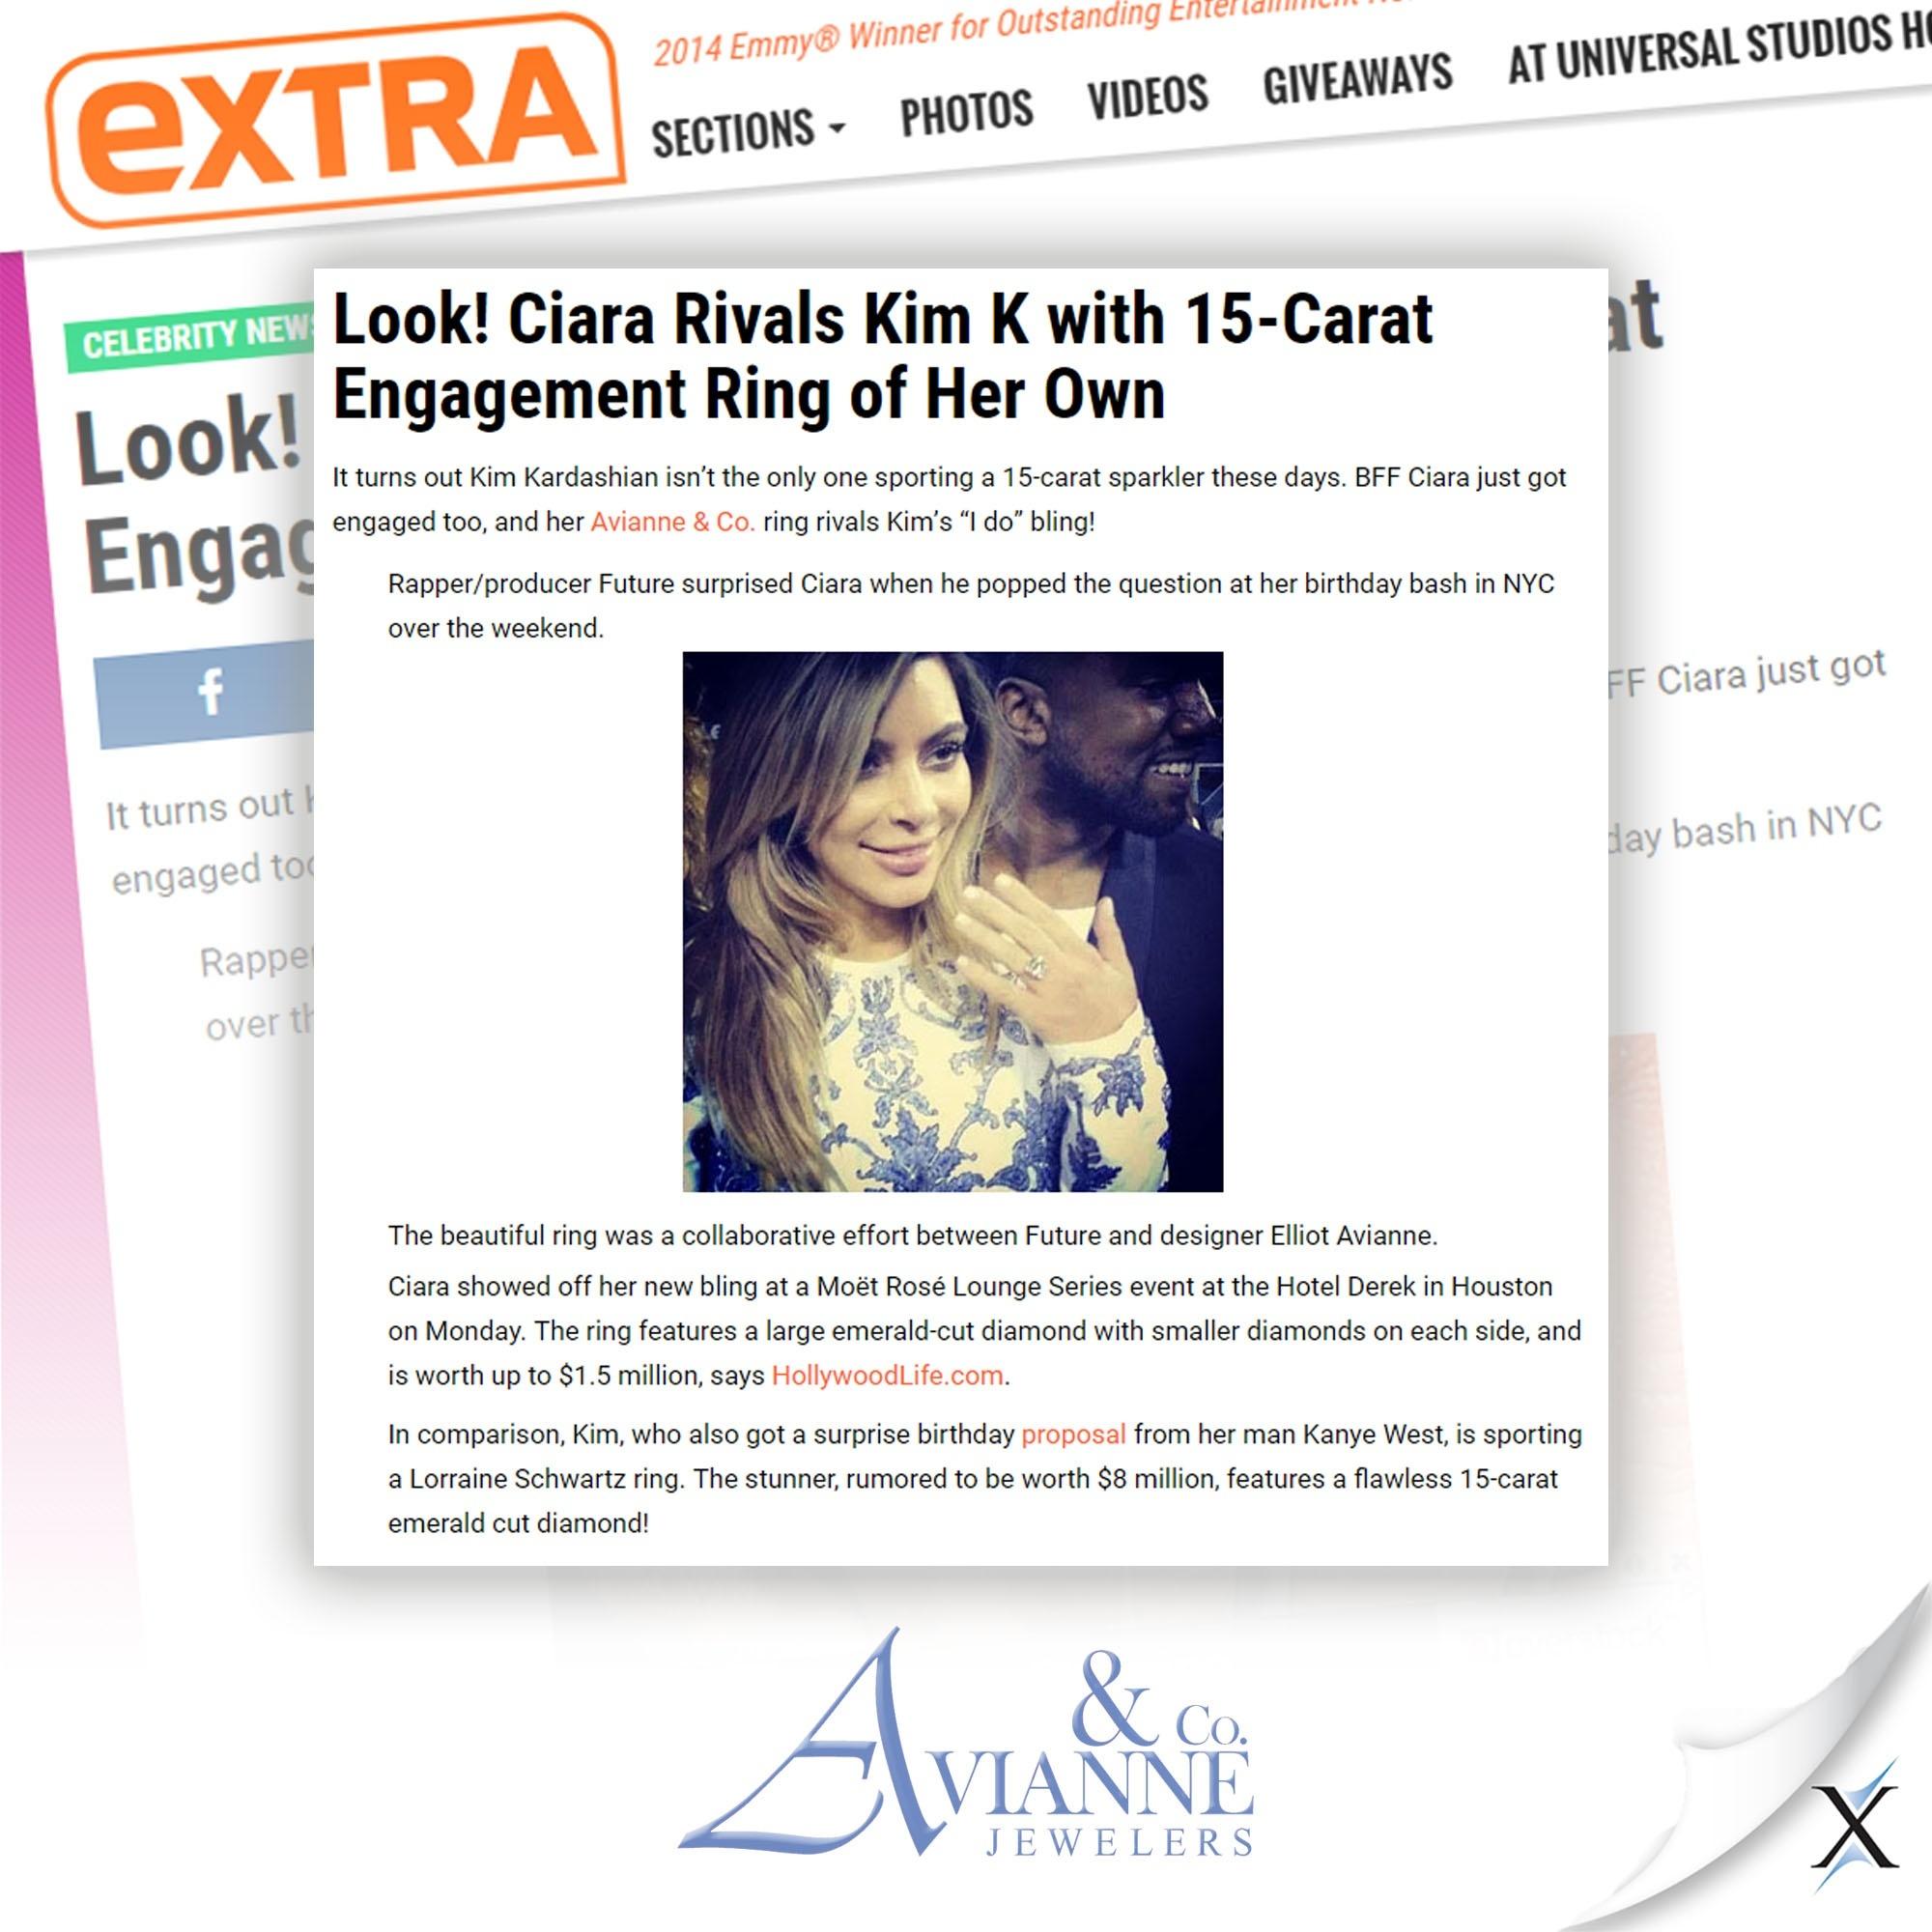 axia-earned-media-image-9